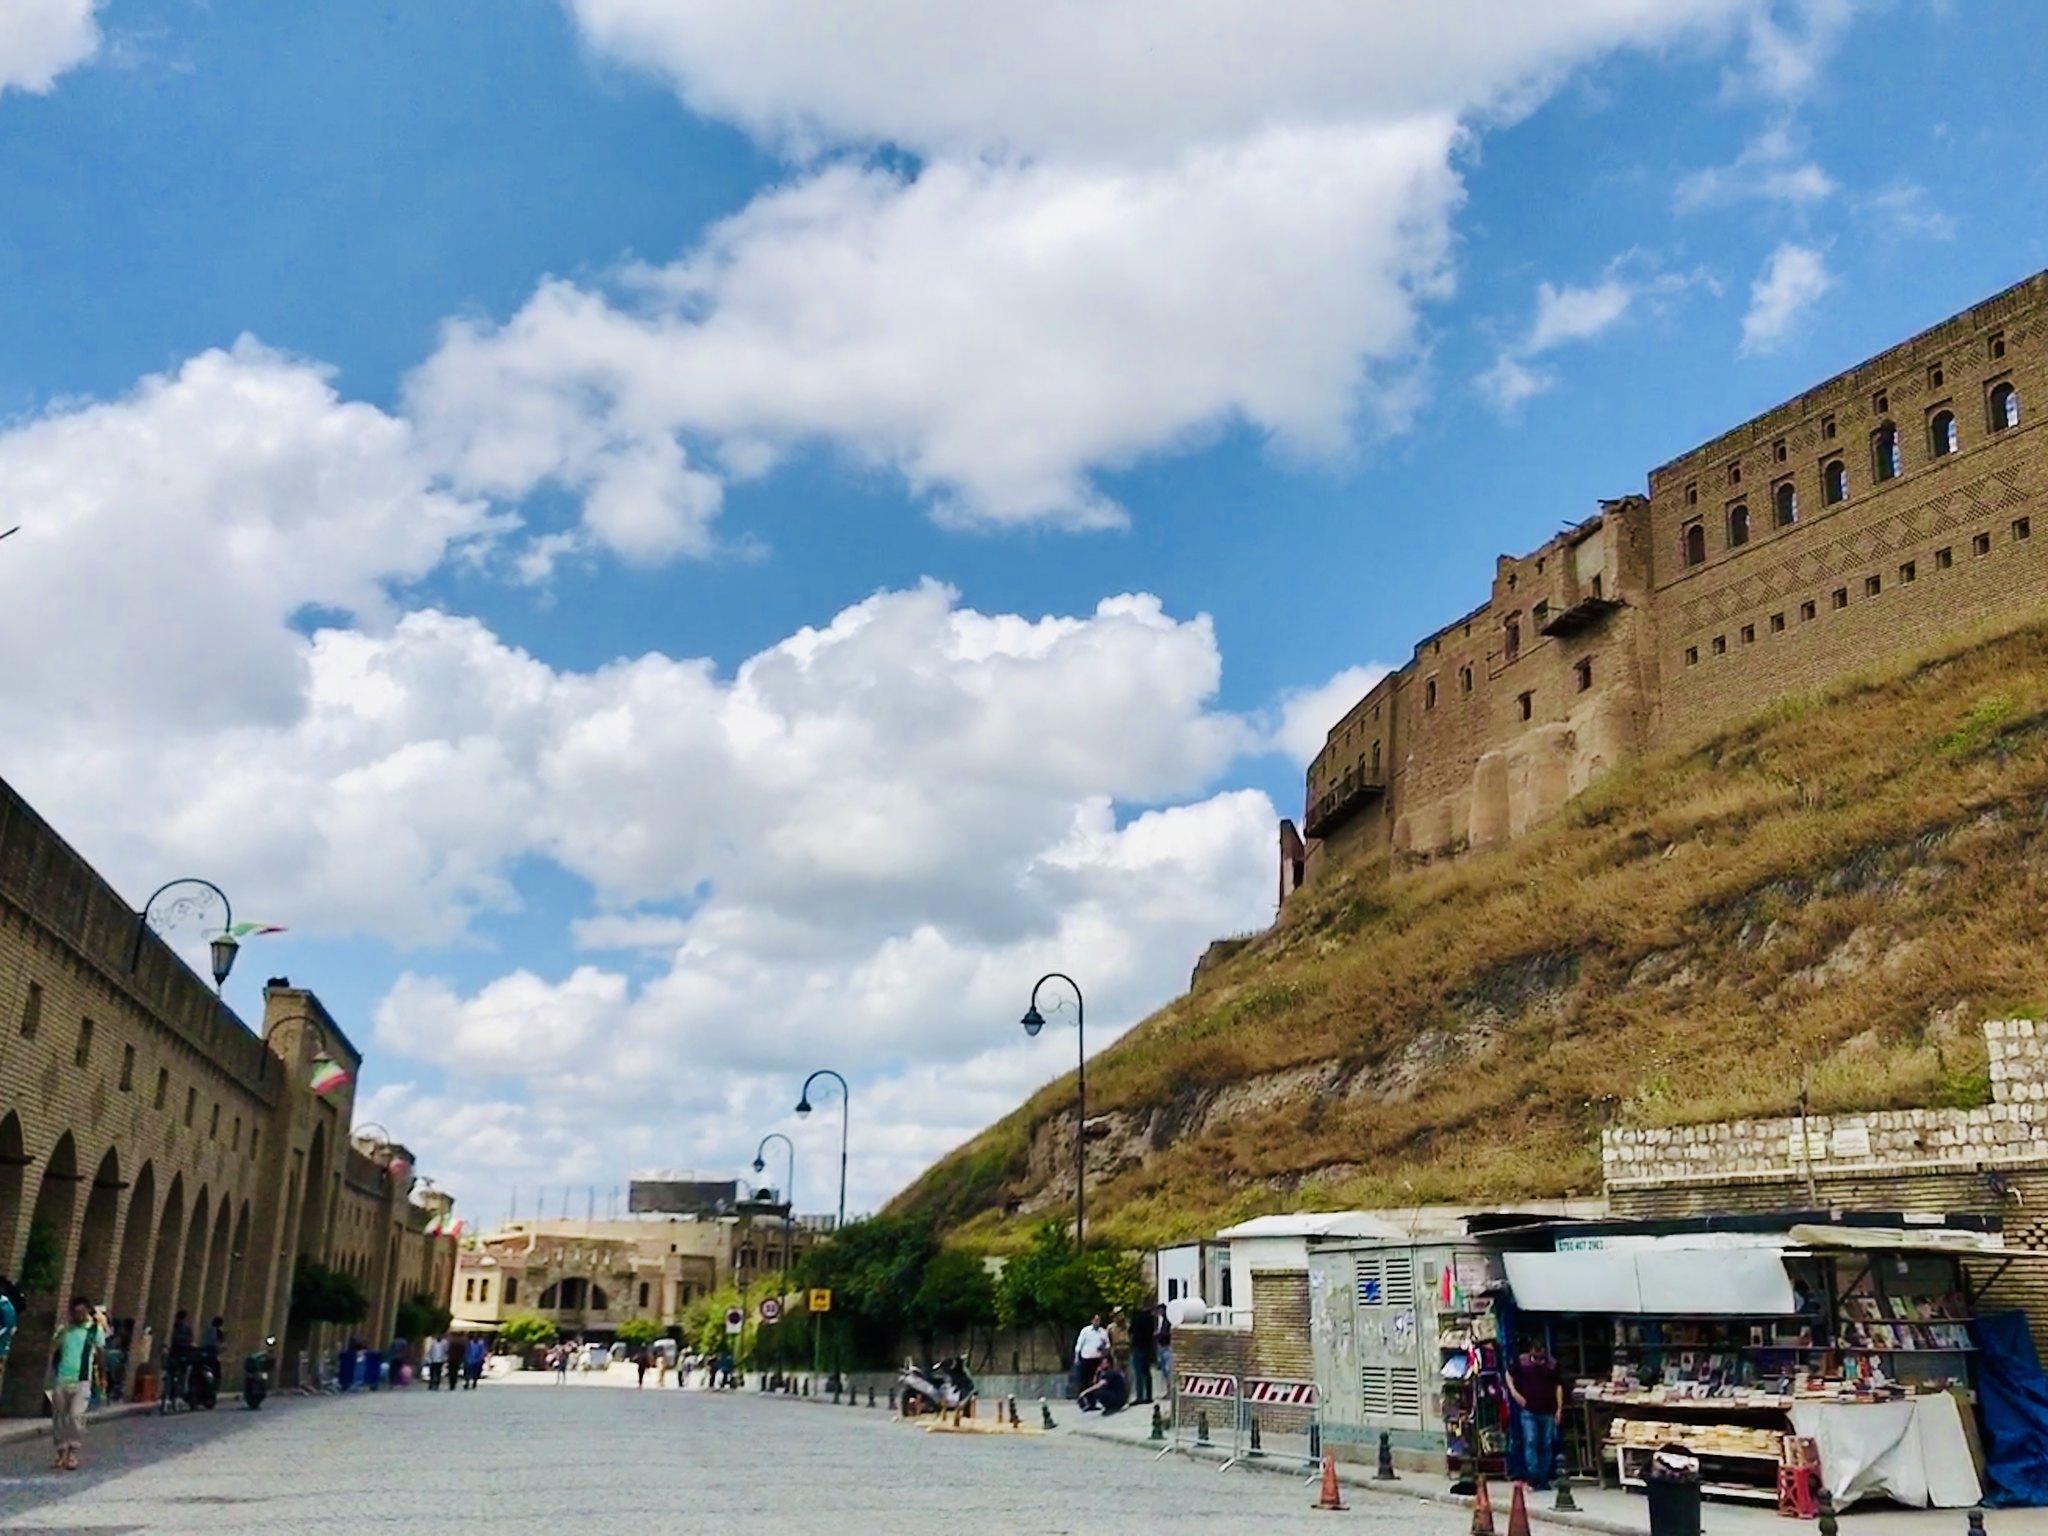 Travel Guide to Erbil, Iraqi Kurdistan [with Sample Itinerary]